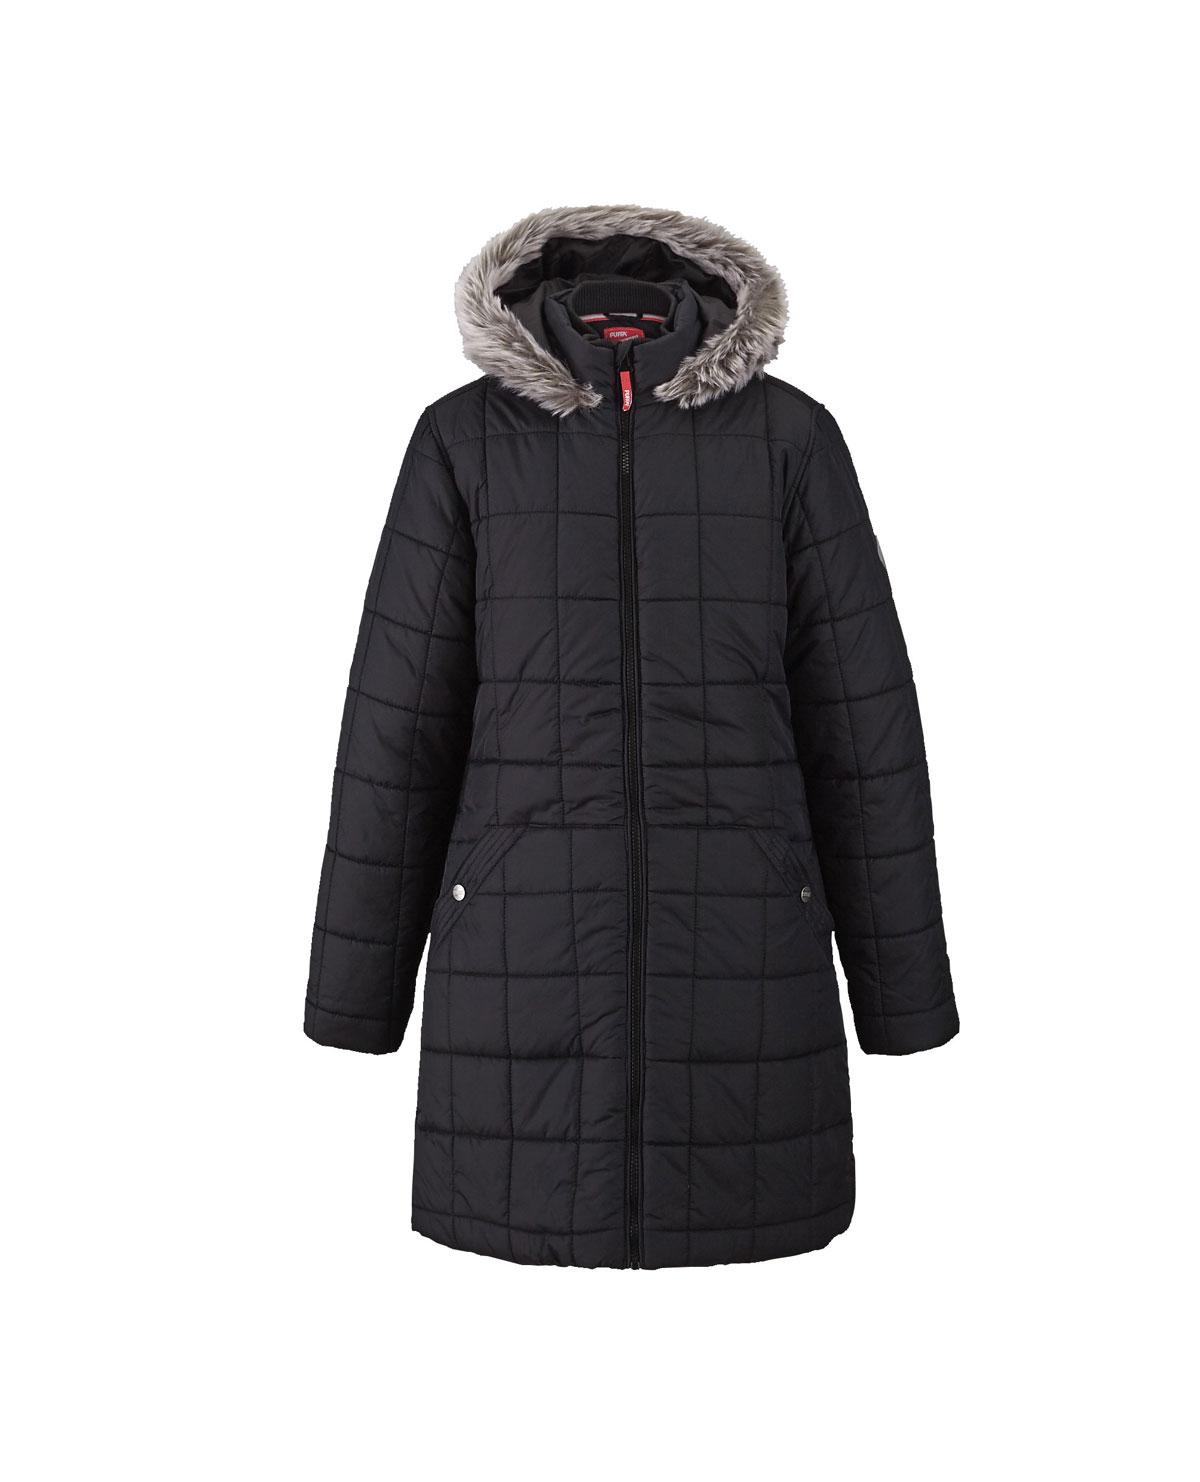 Puffa Girls Longline Hooded Coat.